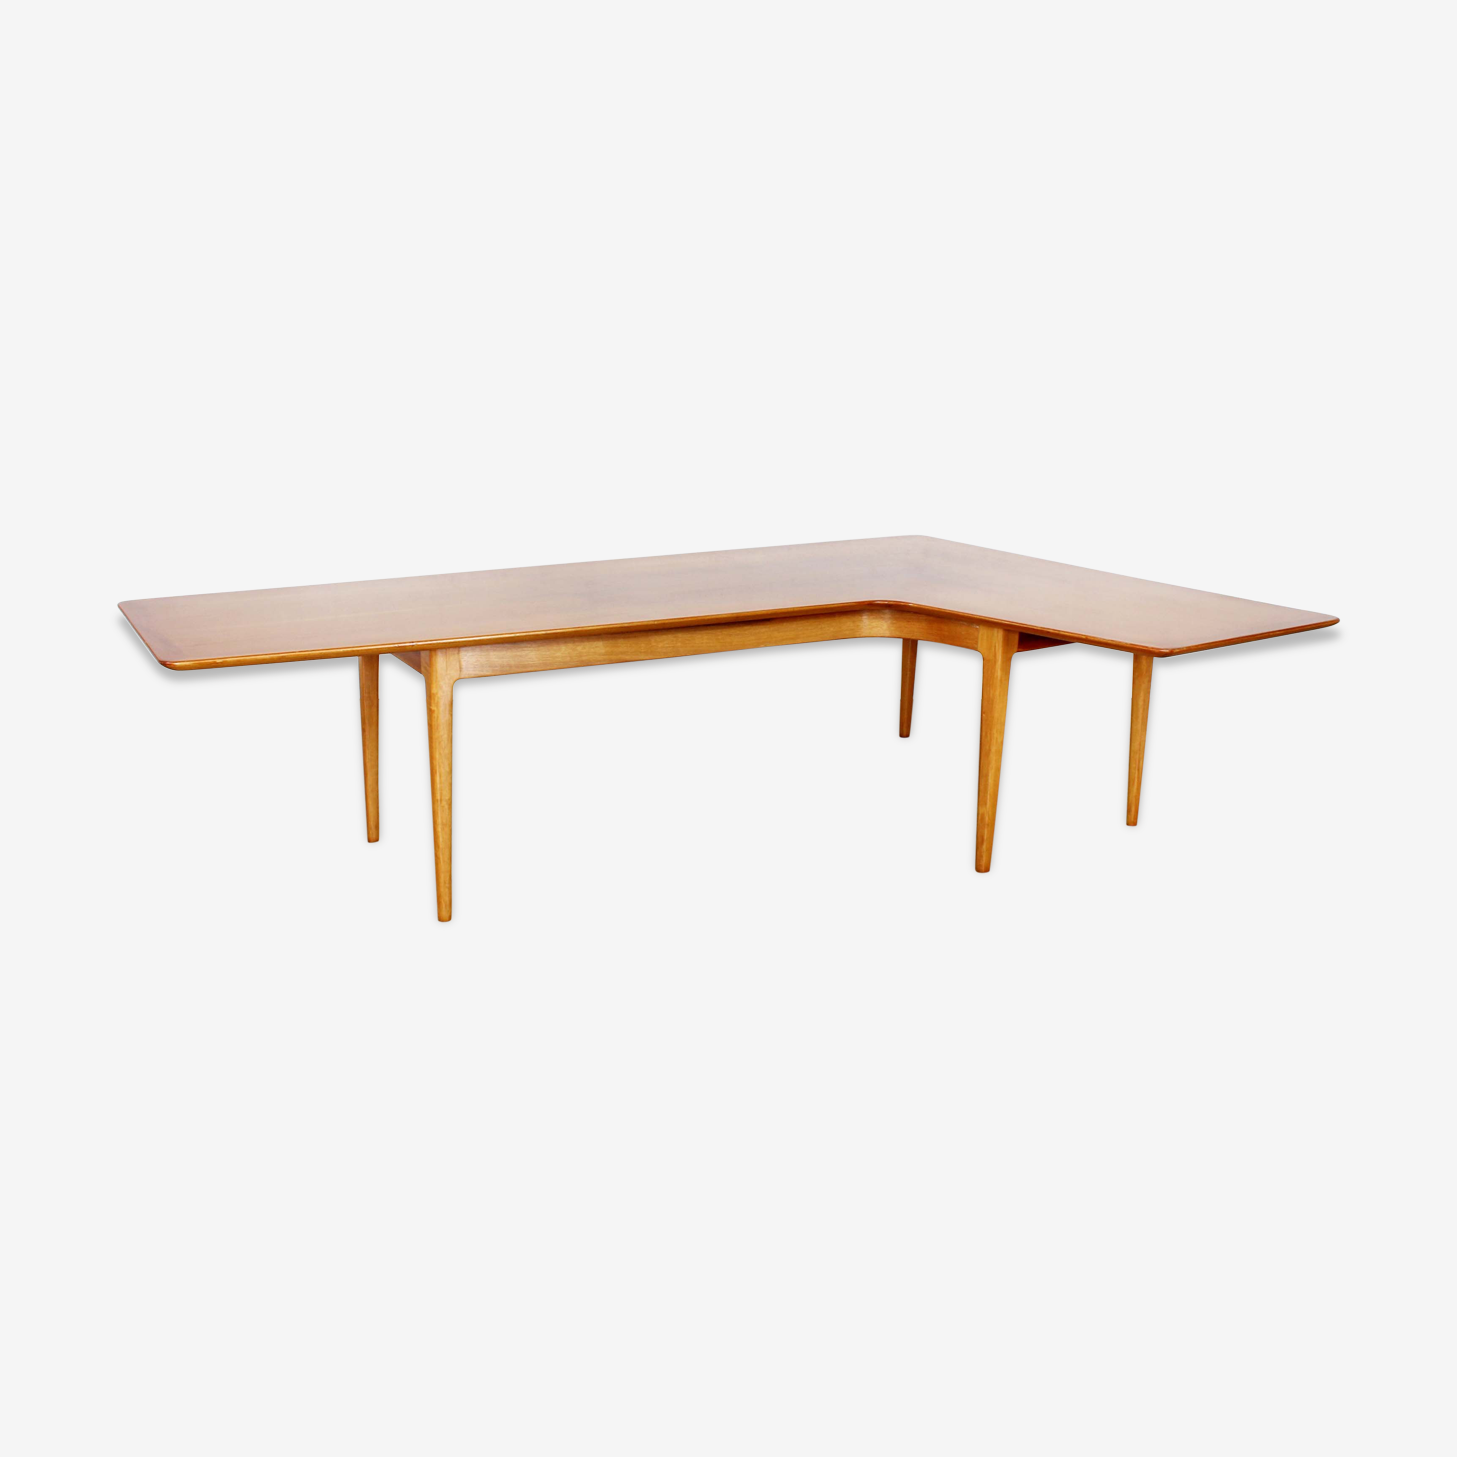 Table basse boomerang scandinave plaquée teck